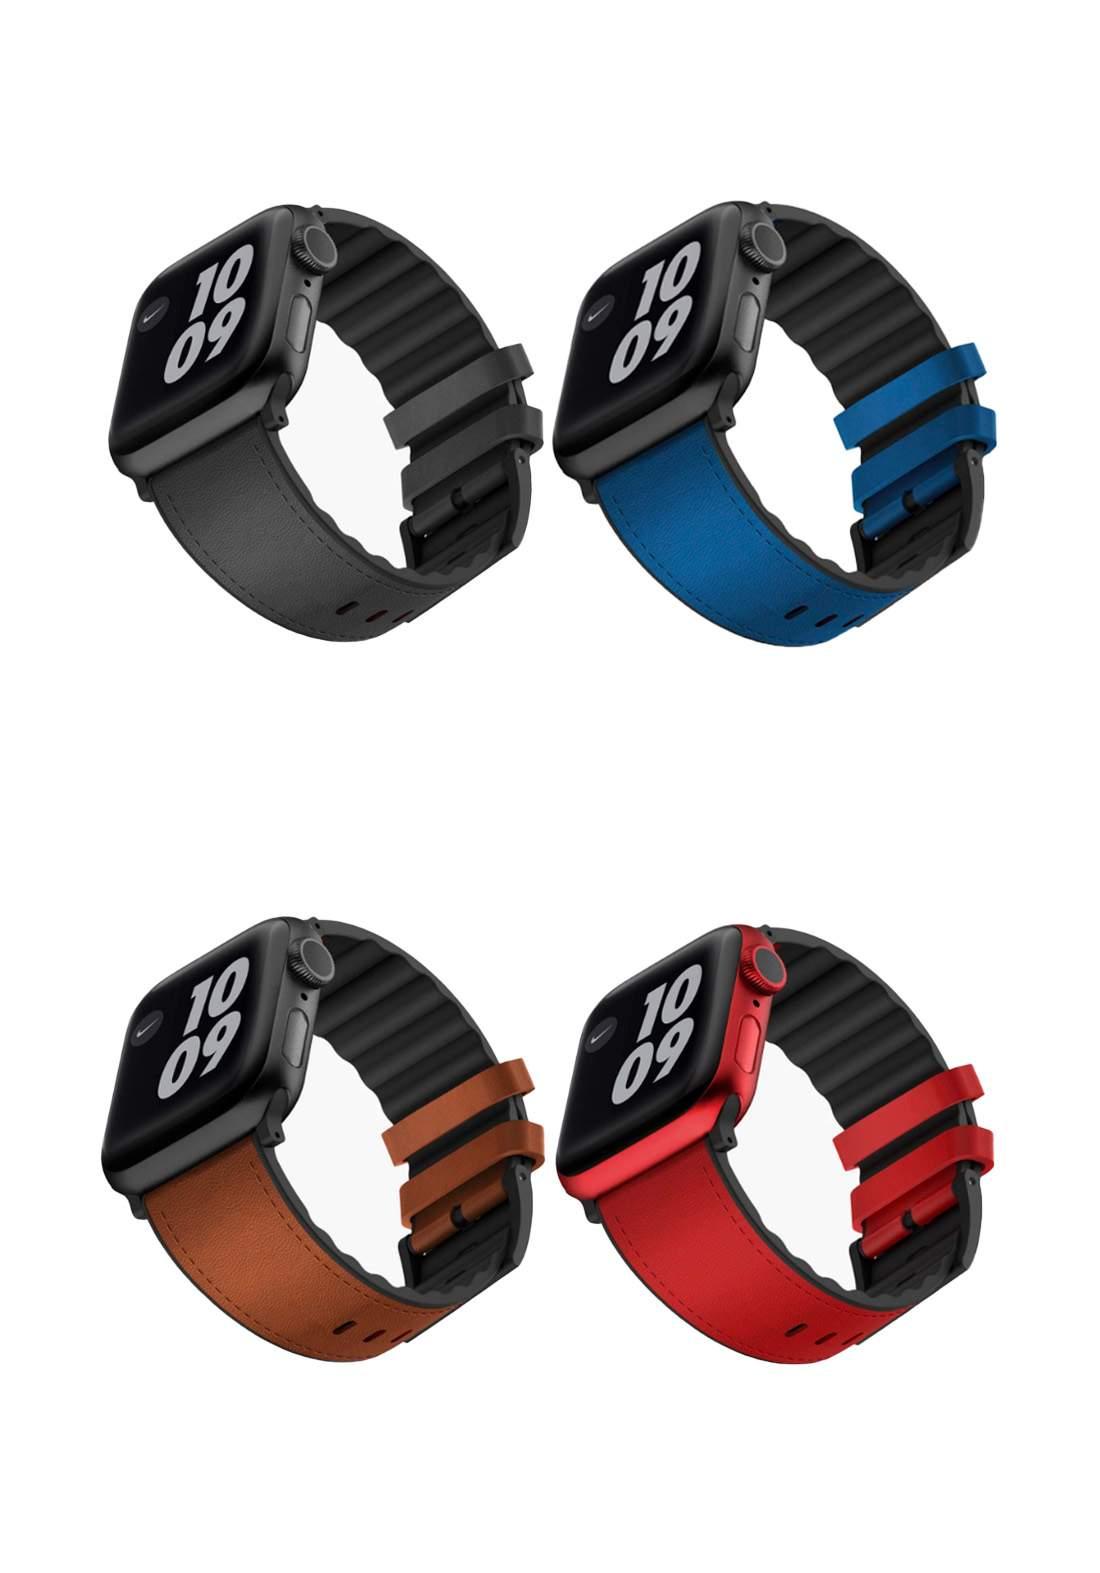 Viva Madrid Ventrix Leather Strap for Apple Watch 42/44mm سوار ساعة